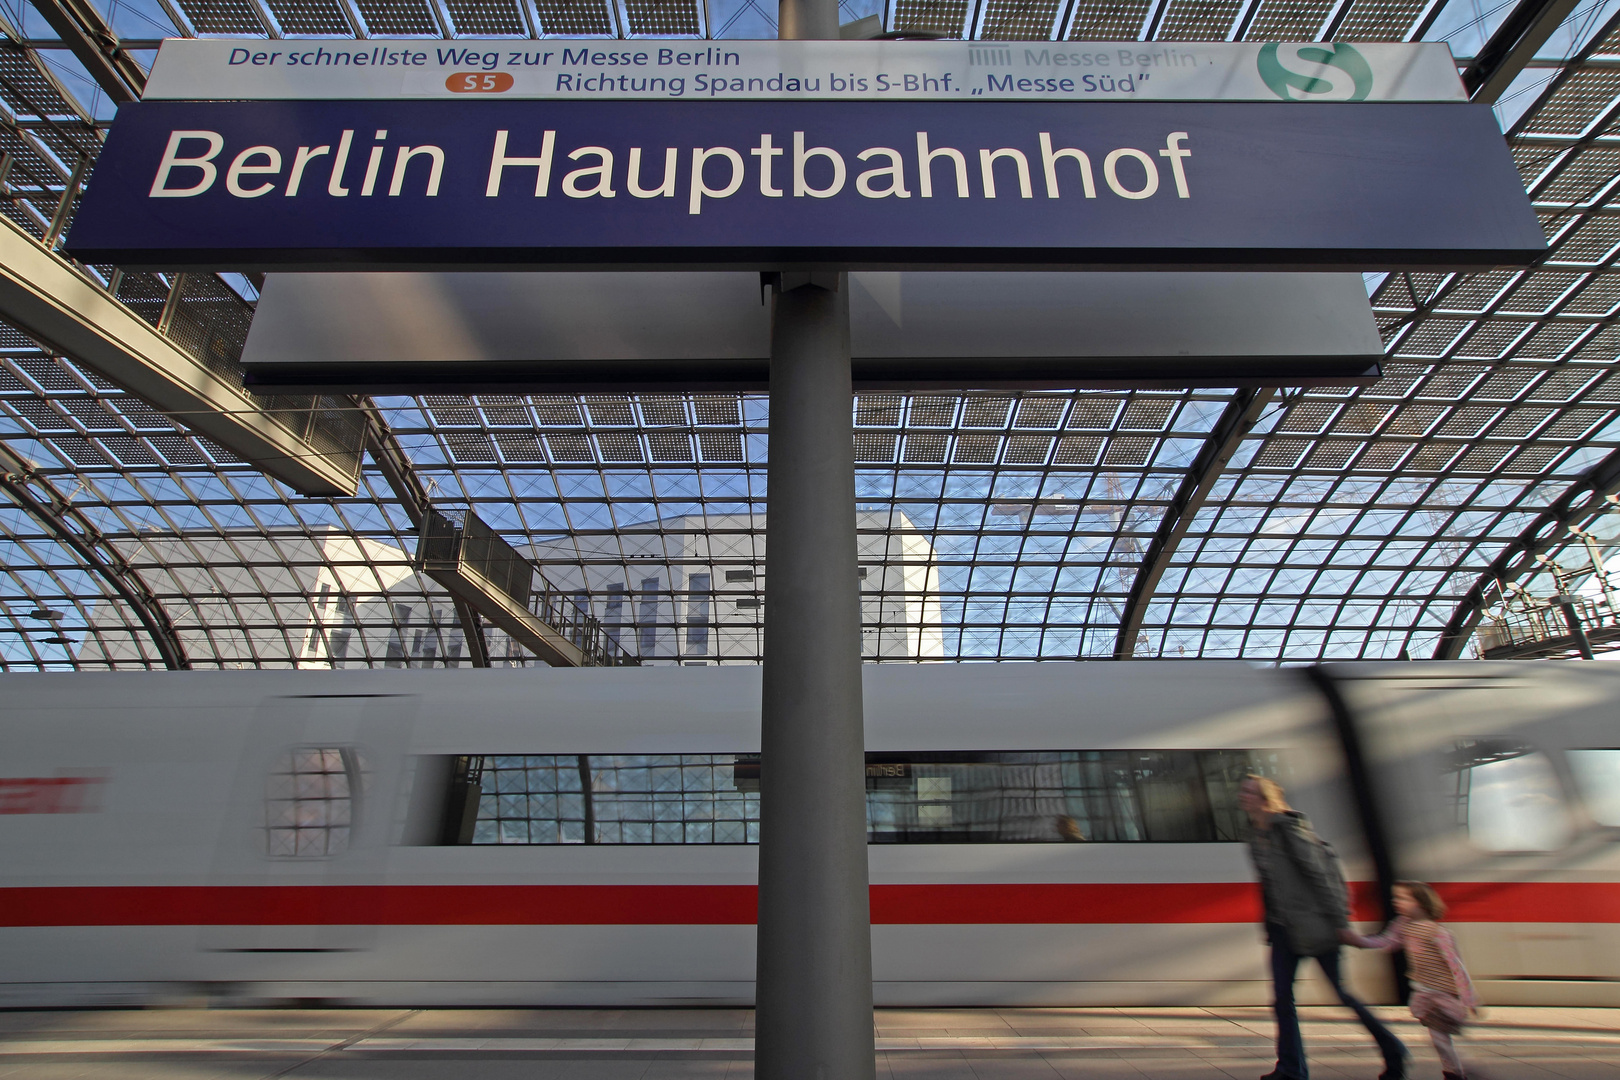 B - Berlin-Hauptbahnhof